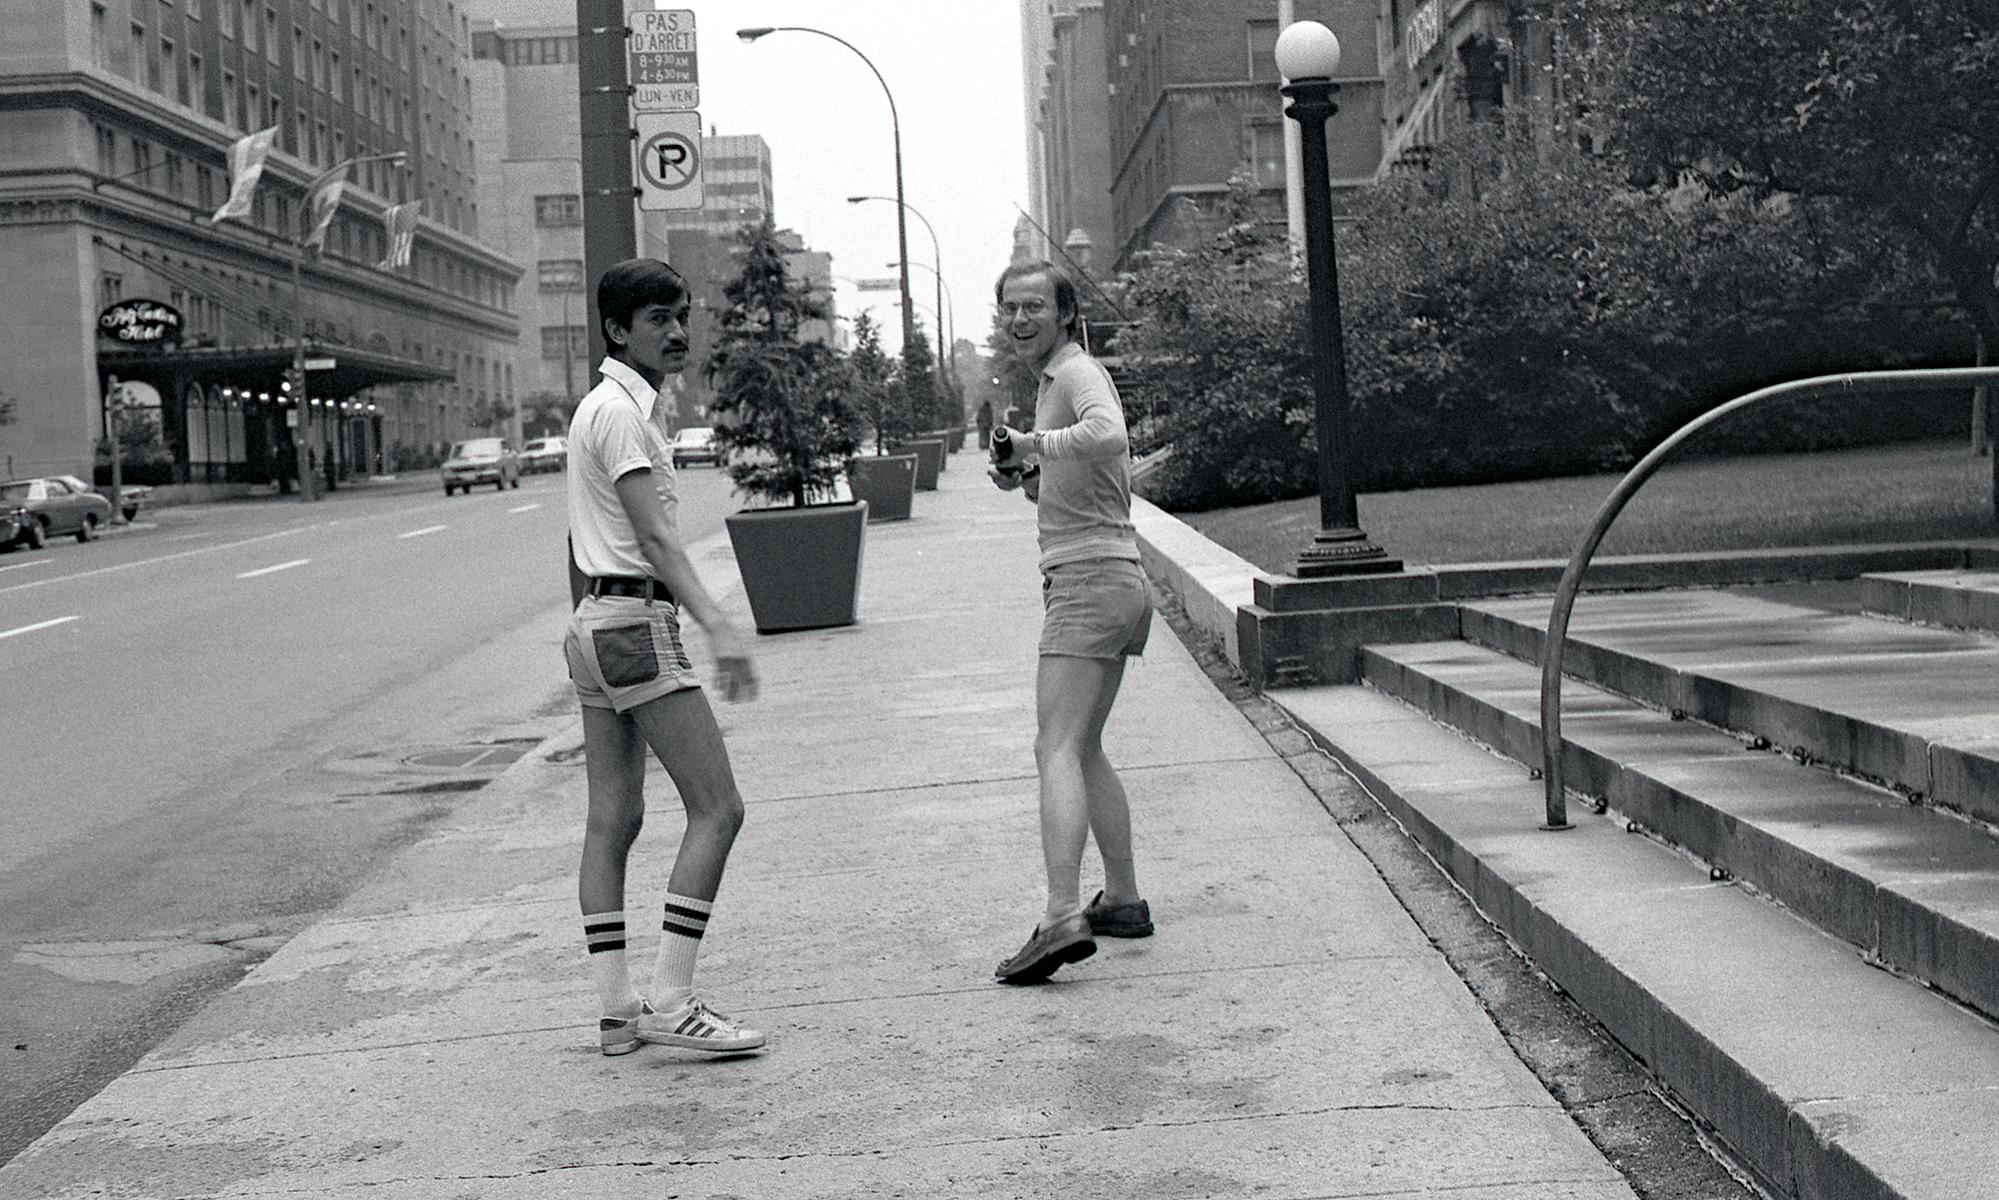 "Sunil Gupta, With my lover Rudi near the Ritz Carlton on Sherbrooke Street, circa 1974. Archival pigment print, 23 x 15"". © Sunil Gupta, courtesy of Stephen Bulger Gallery"